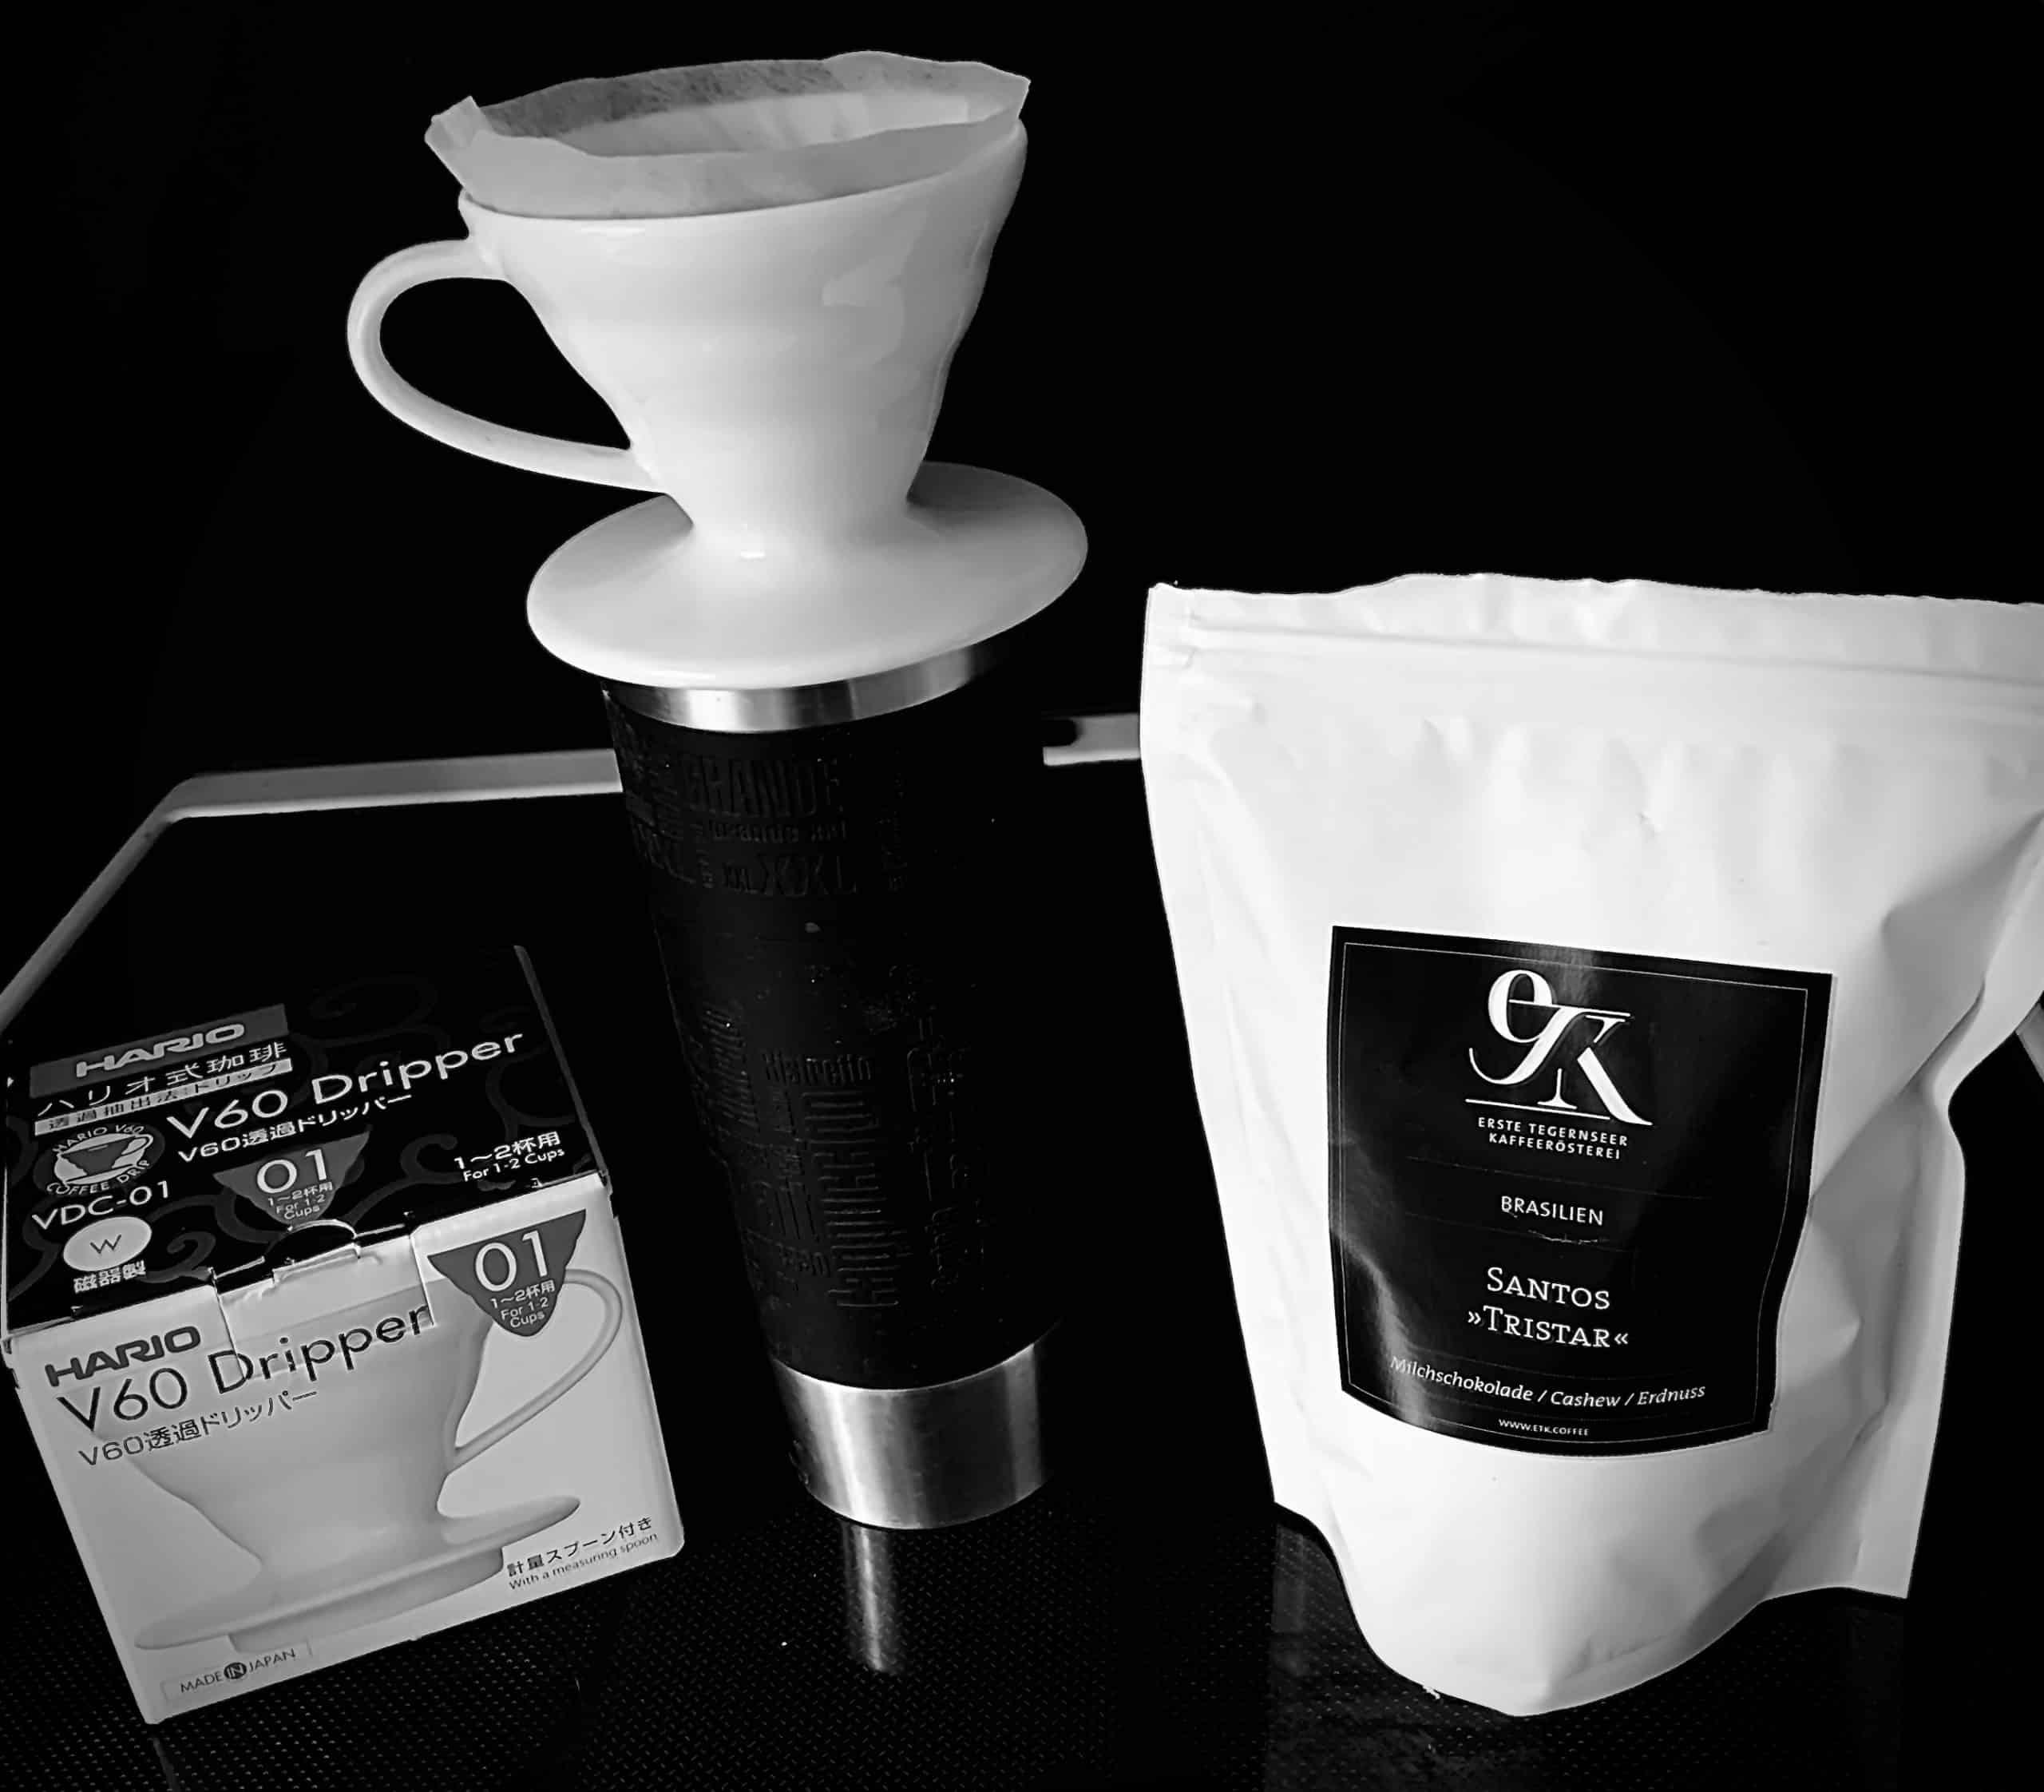 Grandios leckerer Kaffee